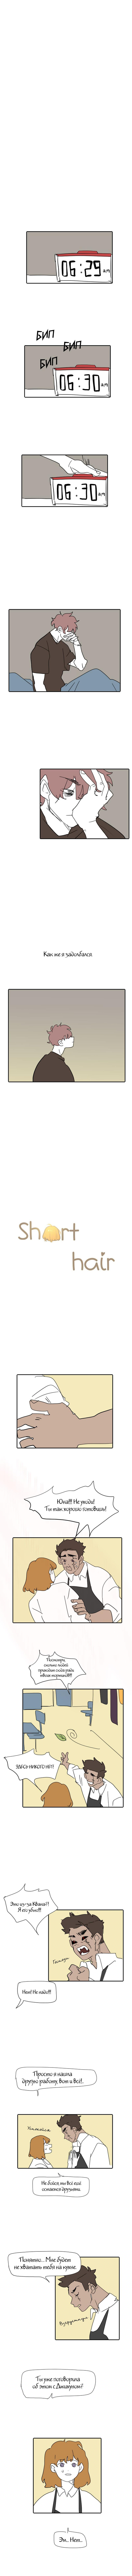 Короткие Волосы 1 - 17 Склад